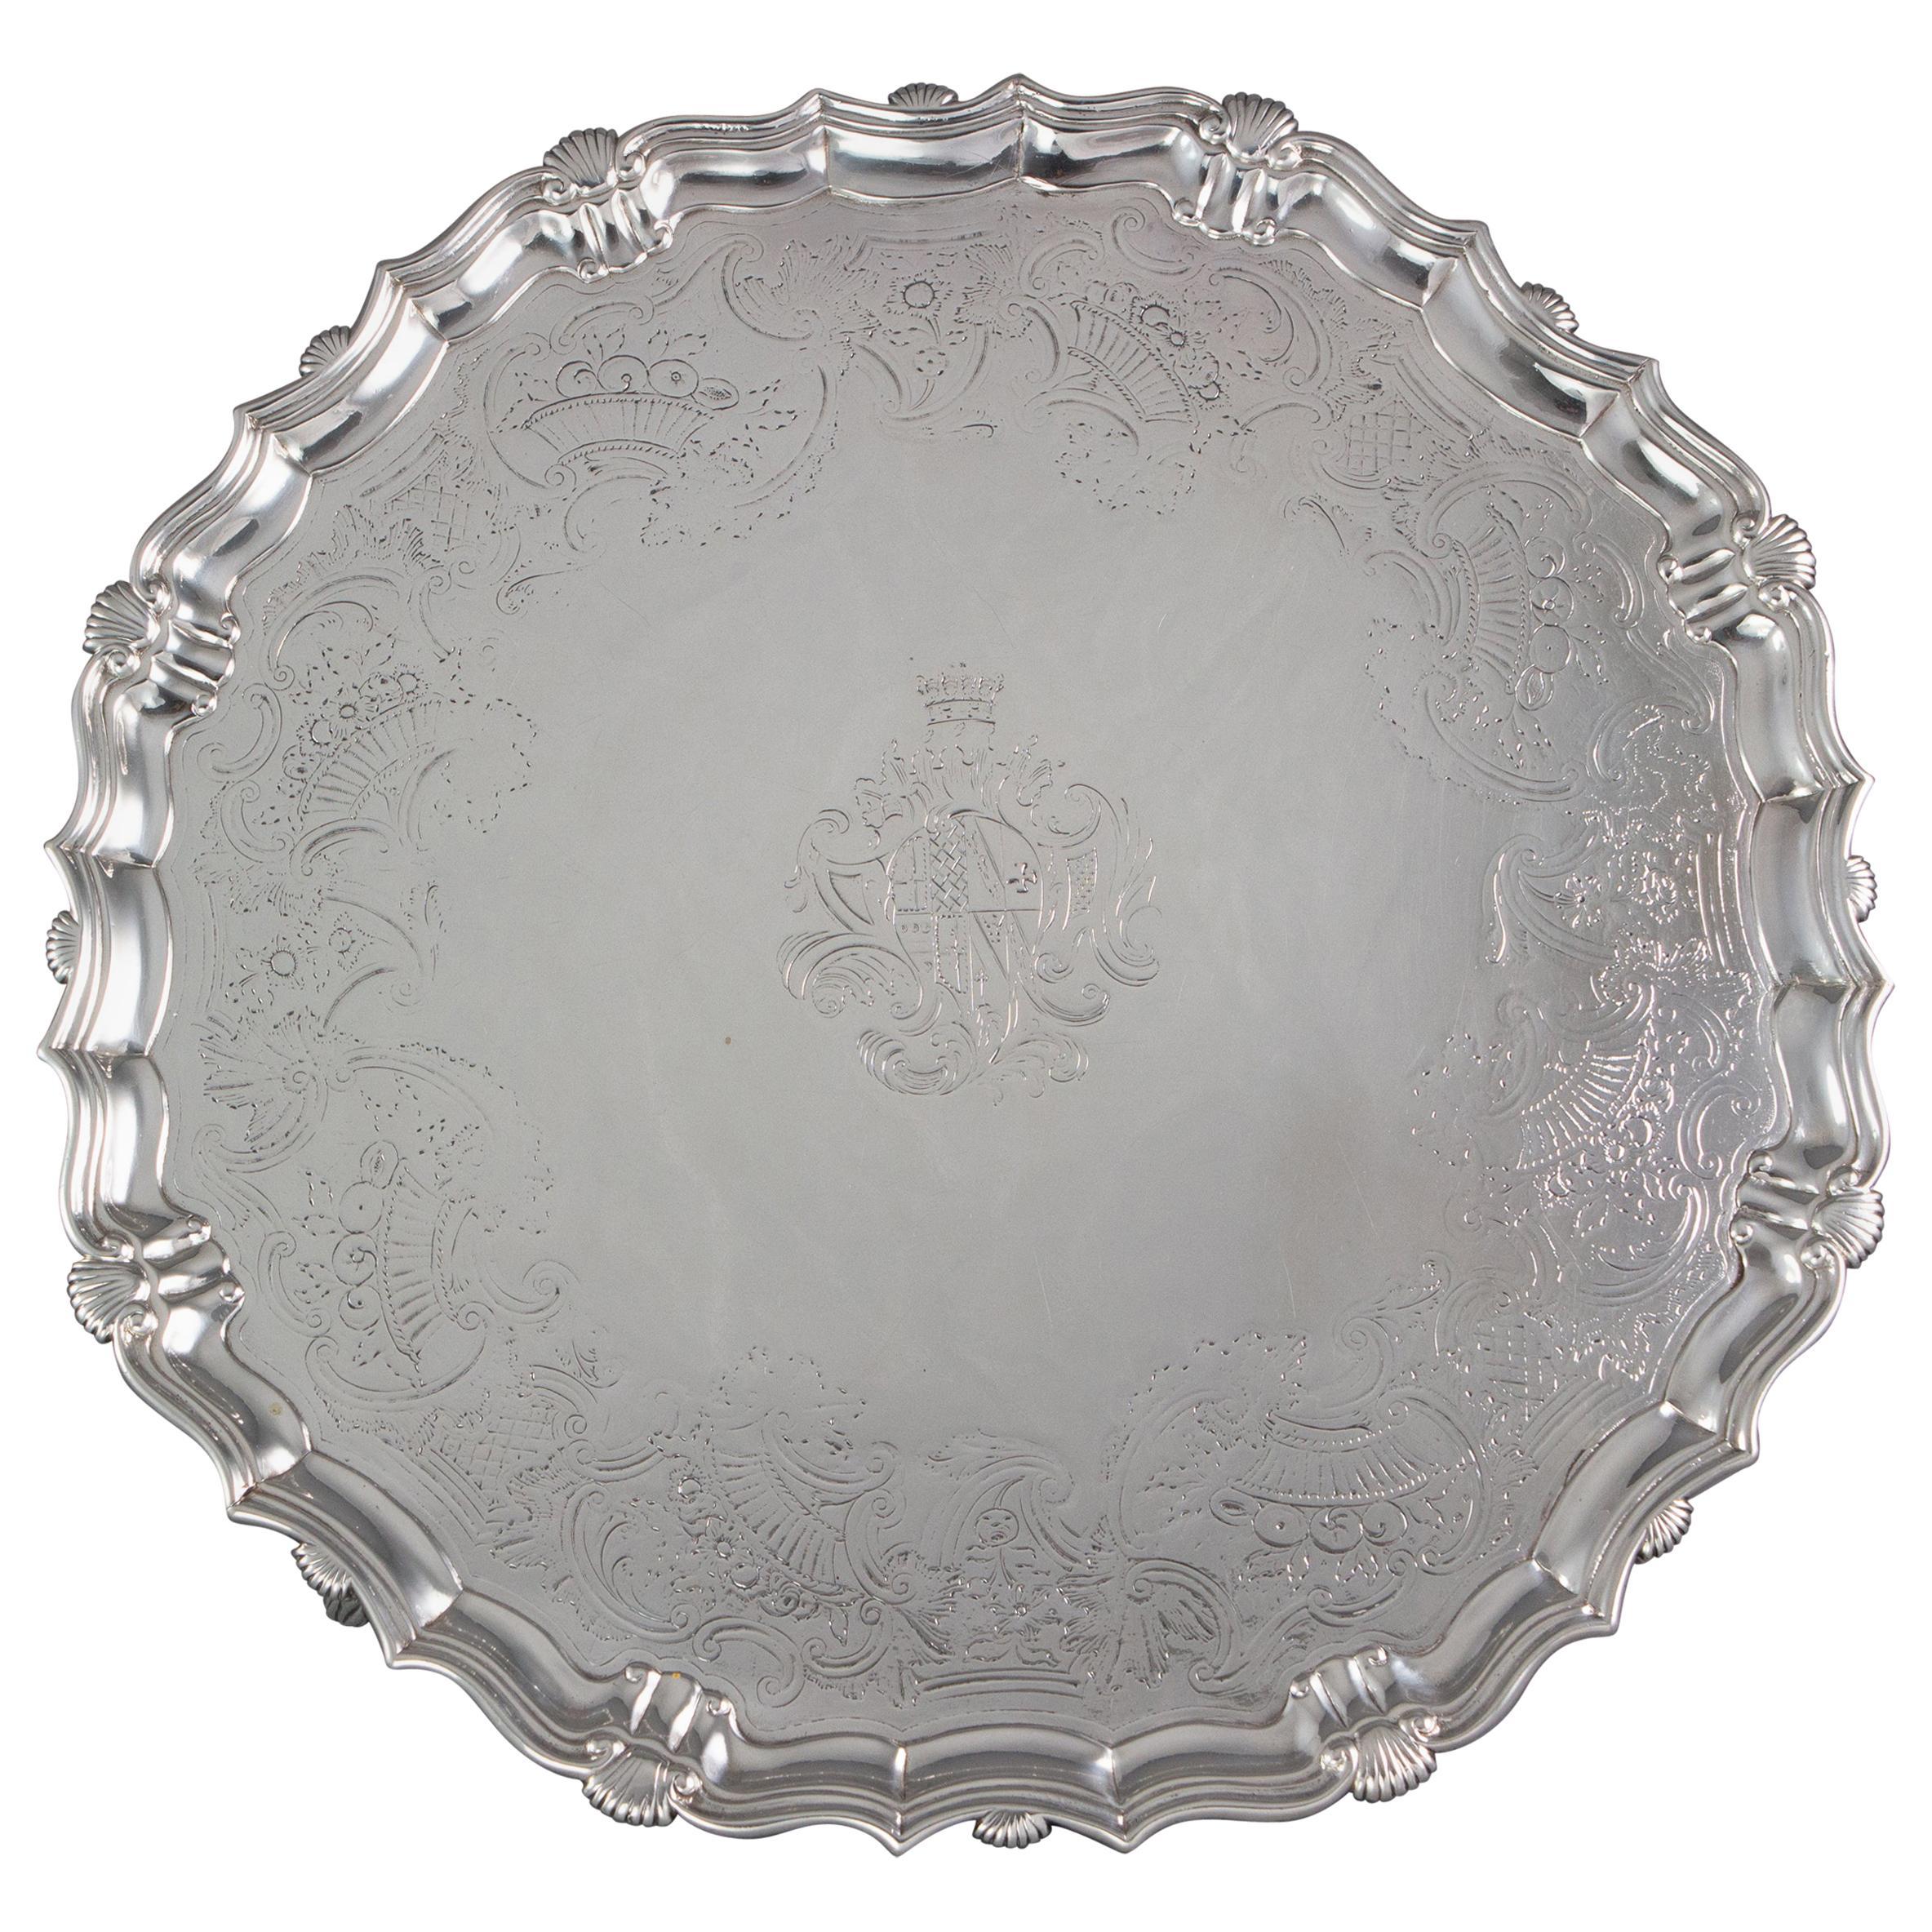 Large George II Silver Salver London 1738 by John Tuite